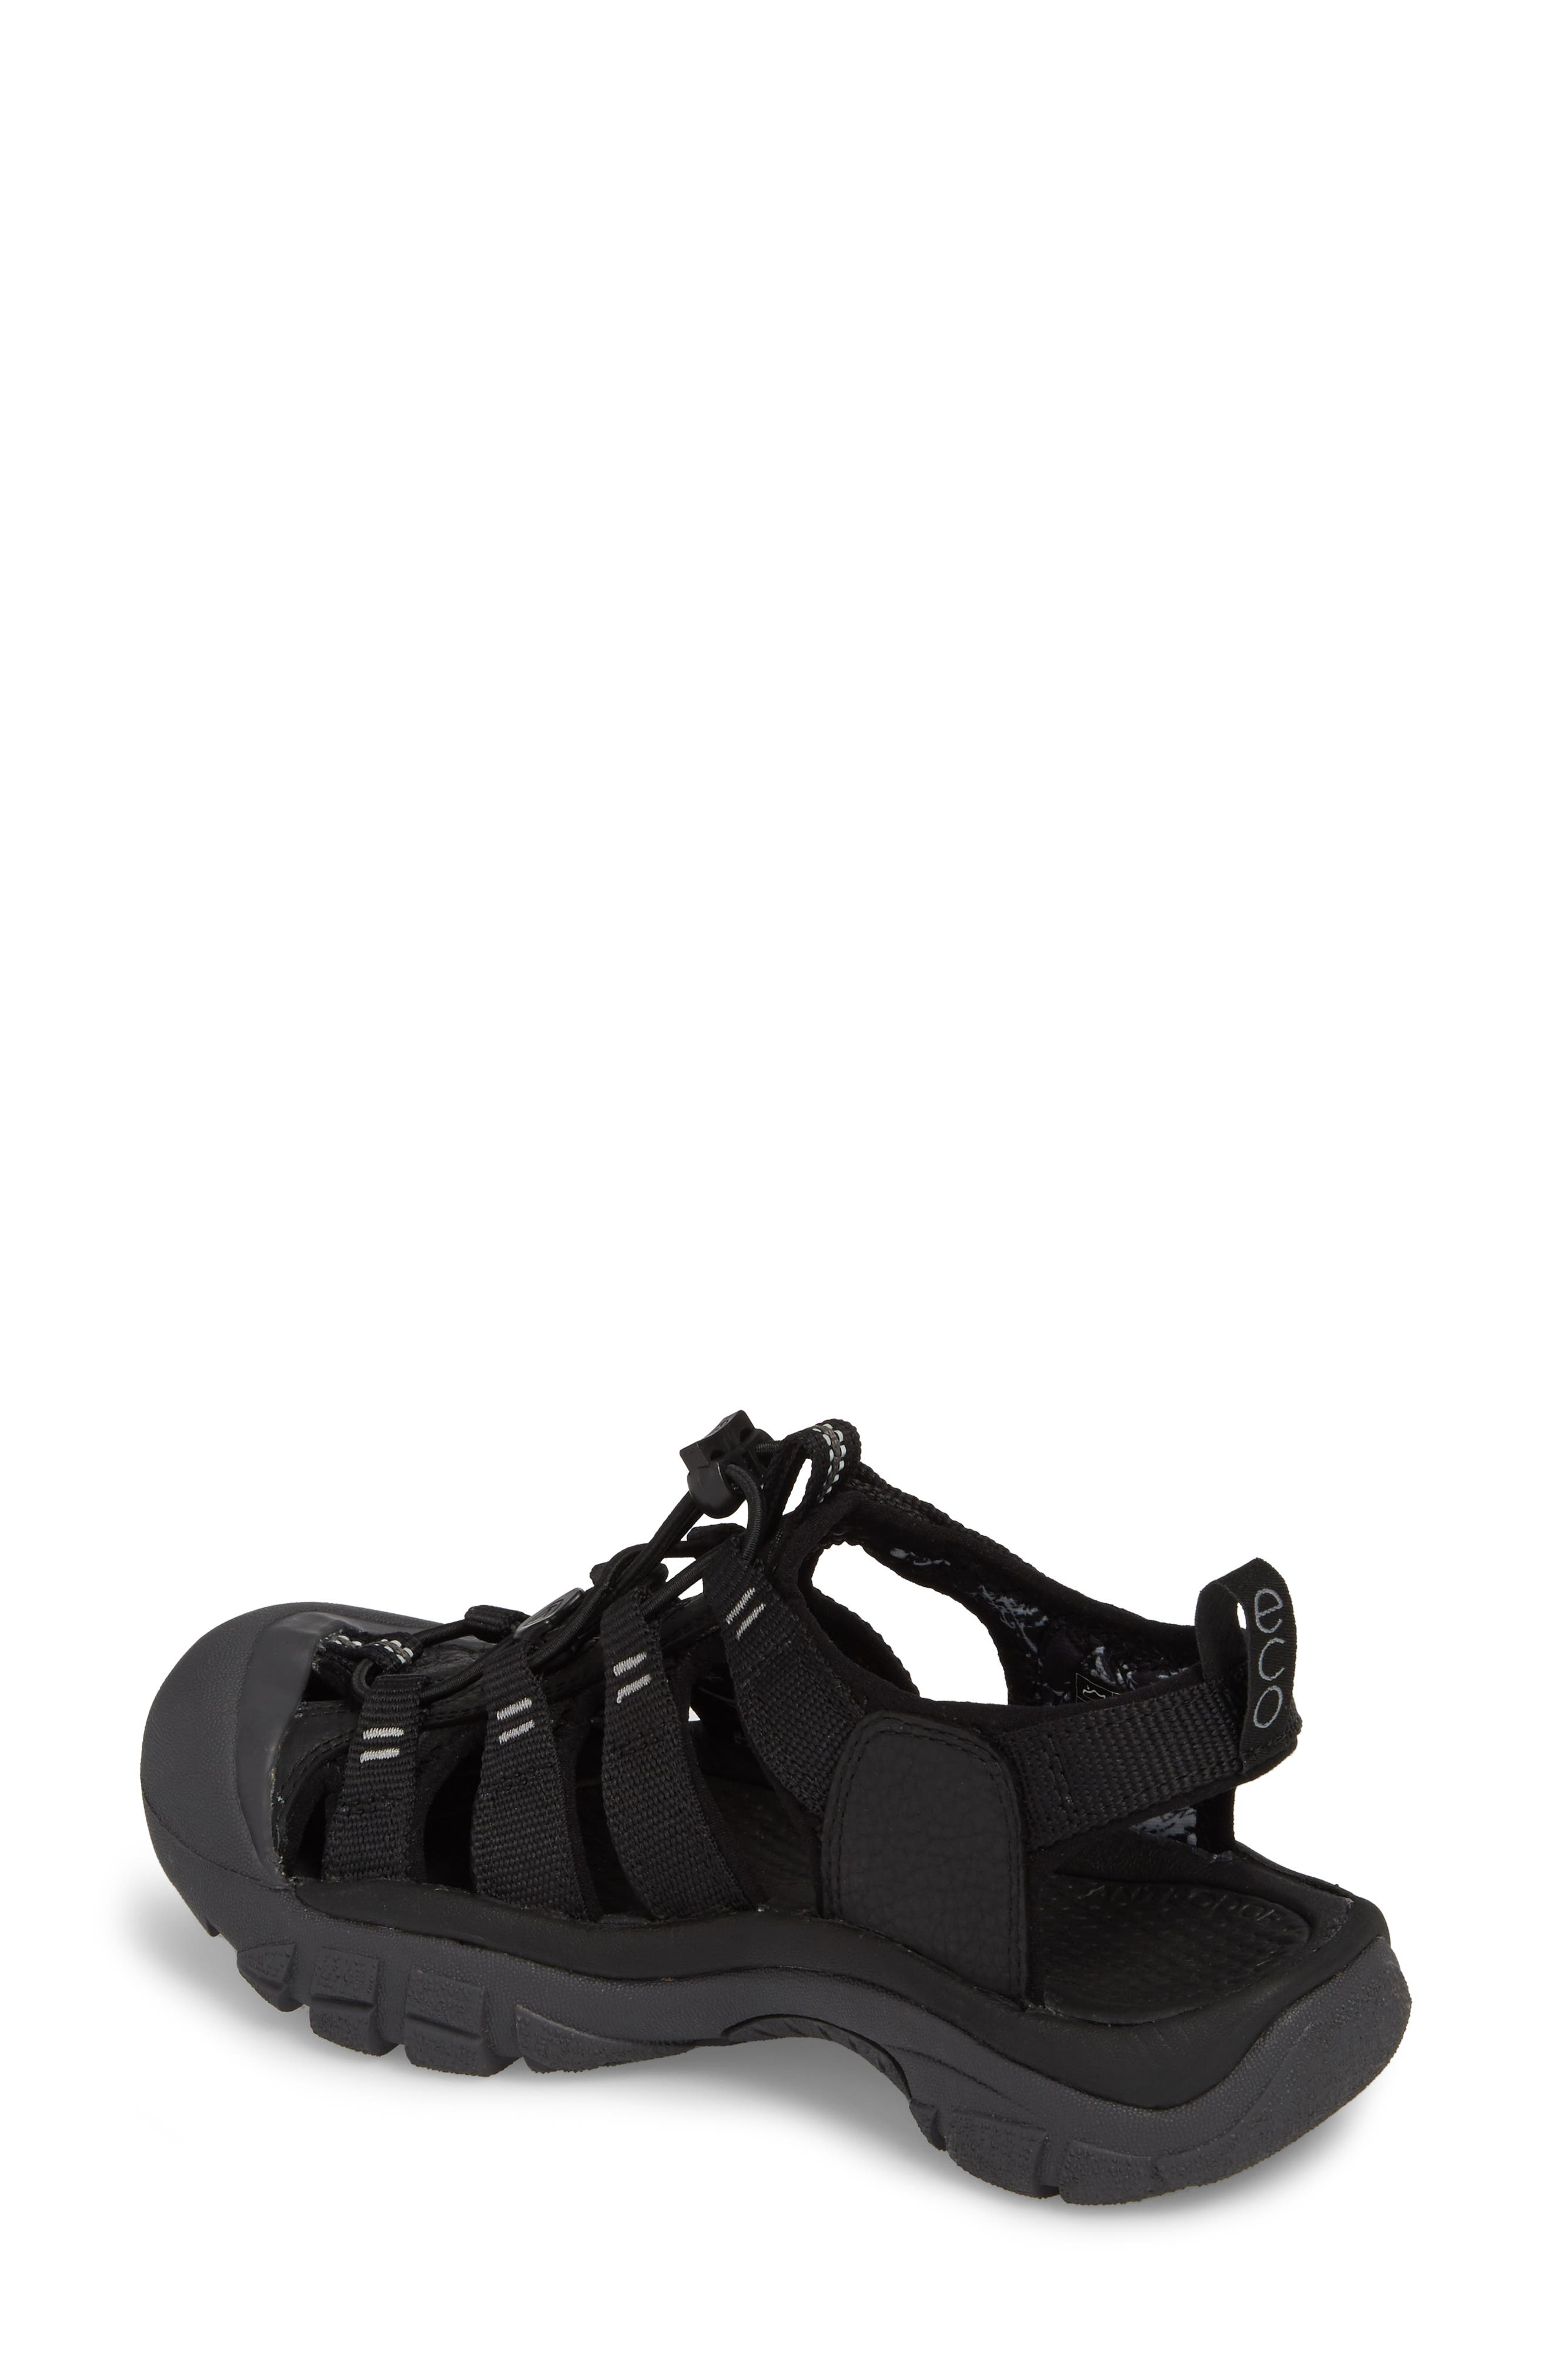 Newport Eco Waterproof Sandal,                             Alternate thumbnail 2, color,                             Black/ Magnet